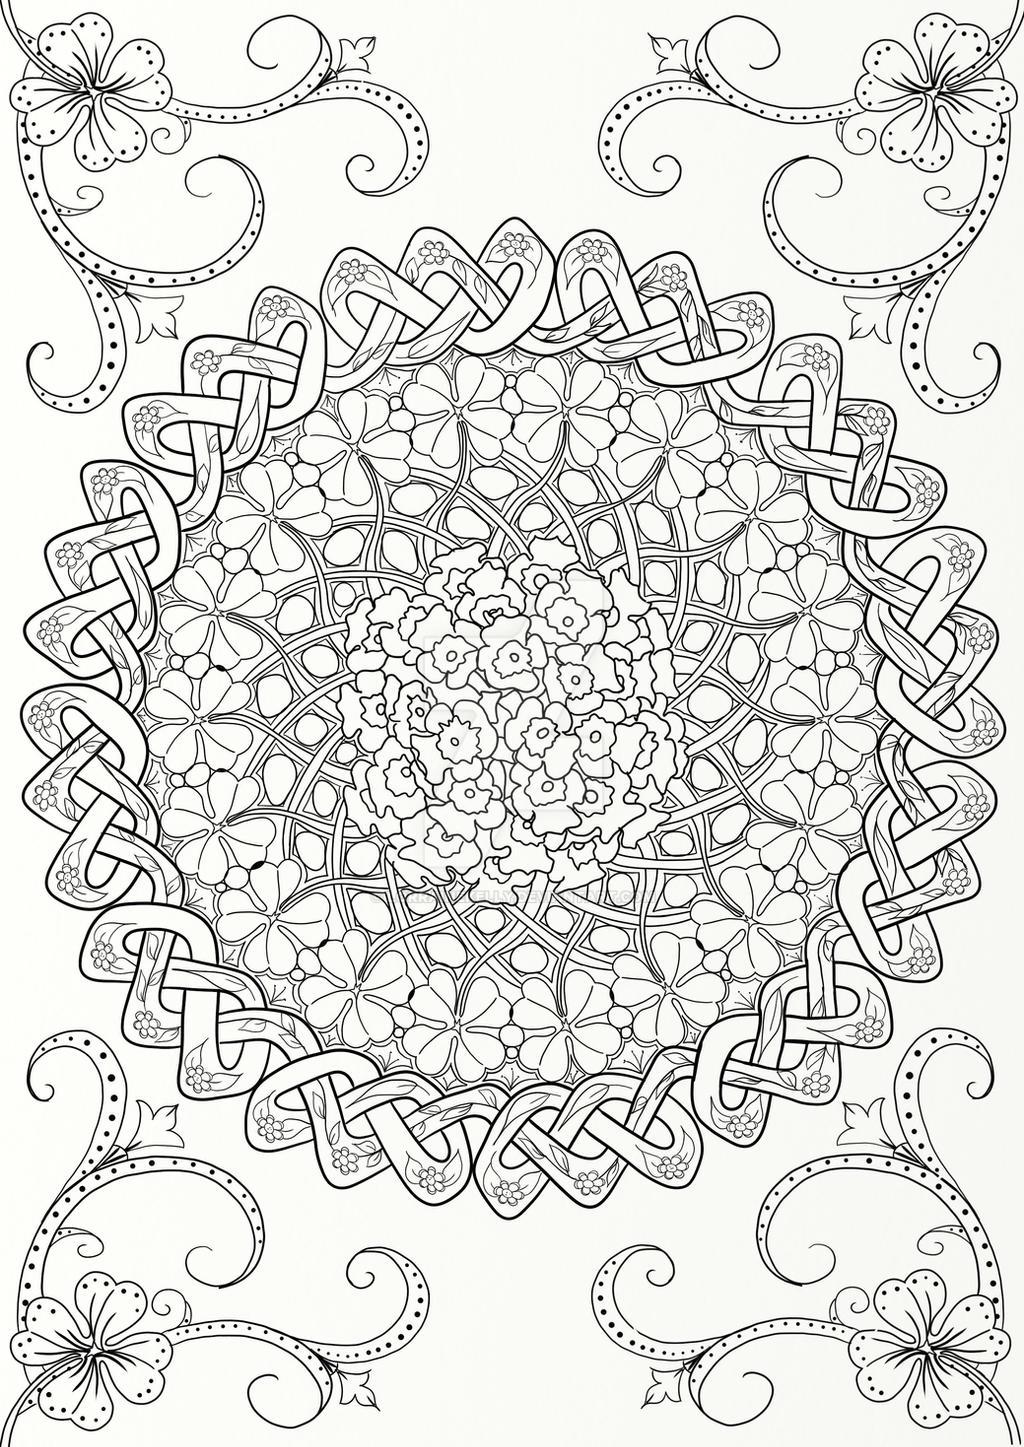 Australian Native Flower Mandala With Celtic Knot By LorraineKelly